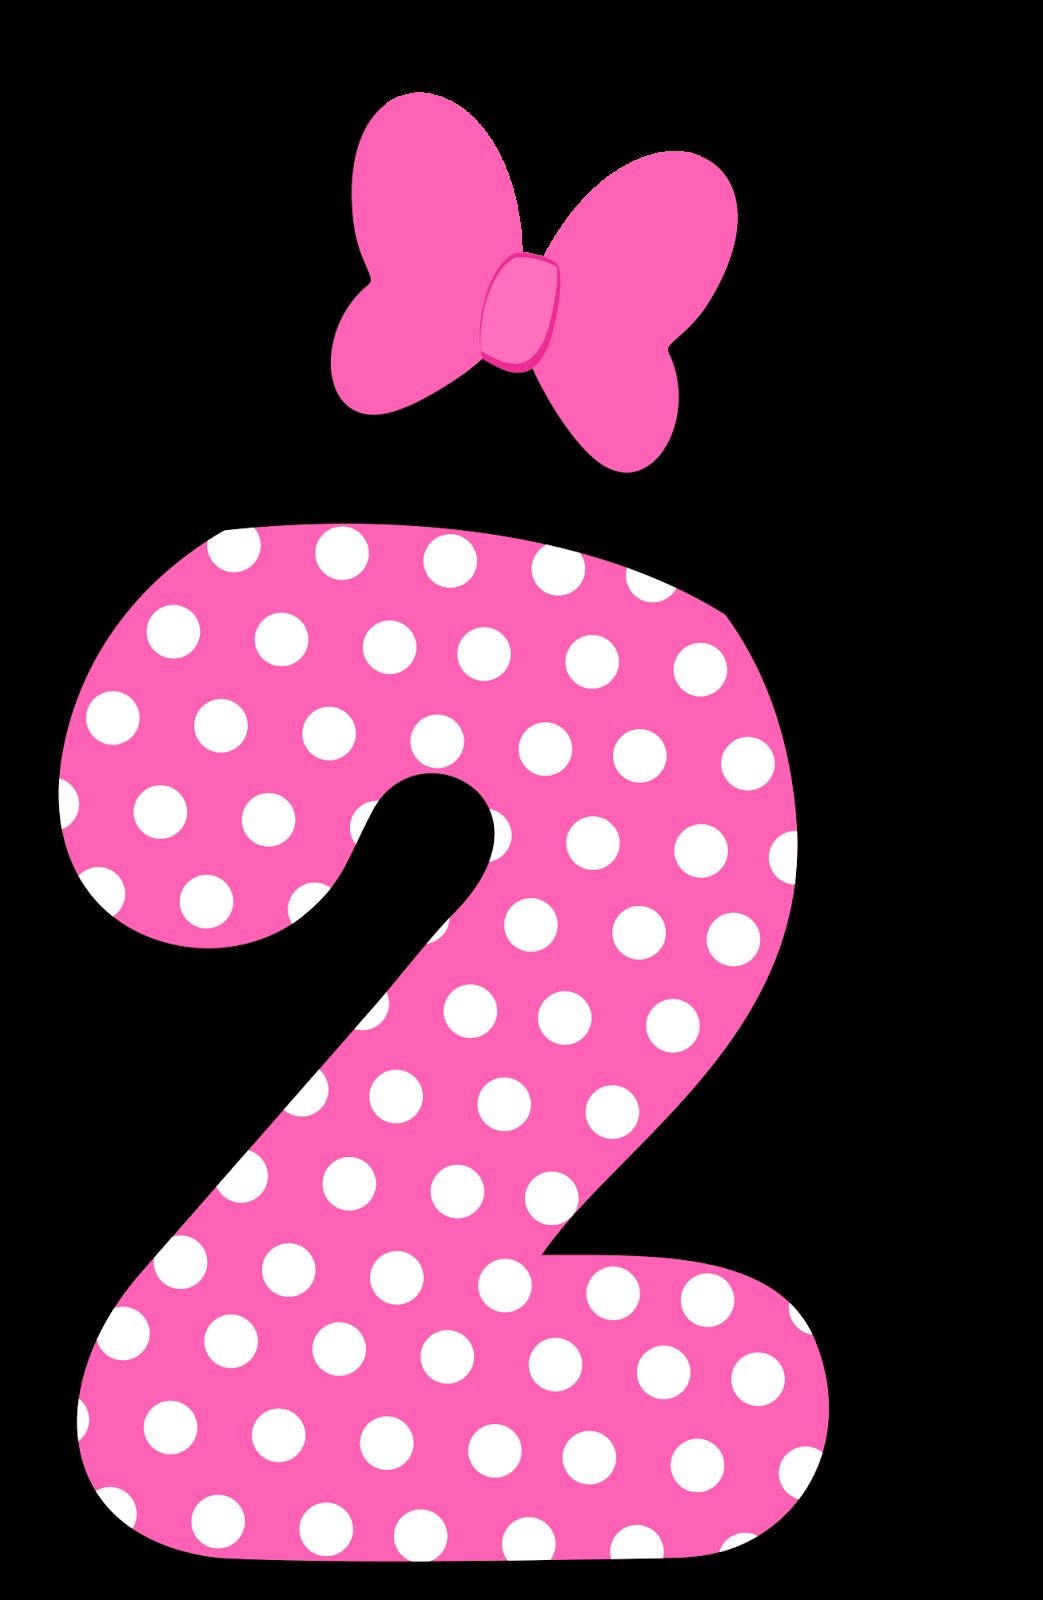 Números a lo Minnie en Rosa..